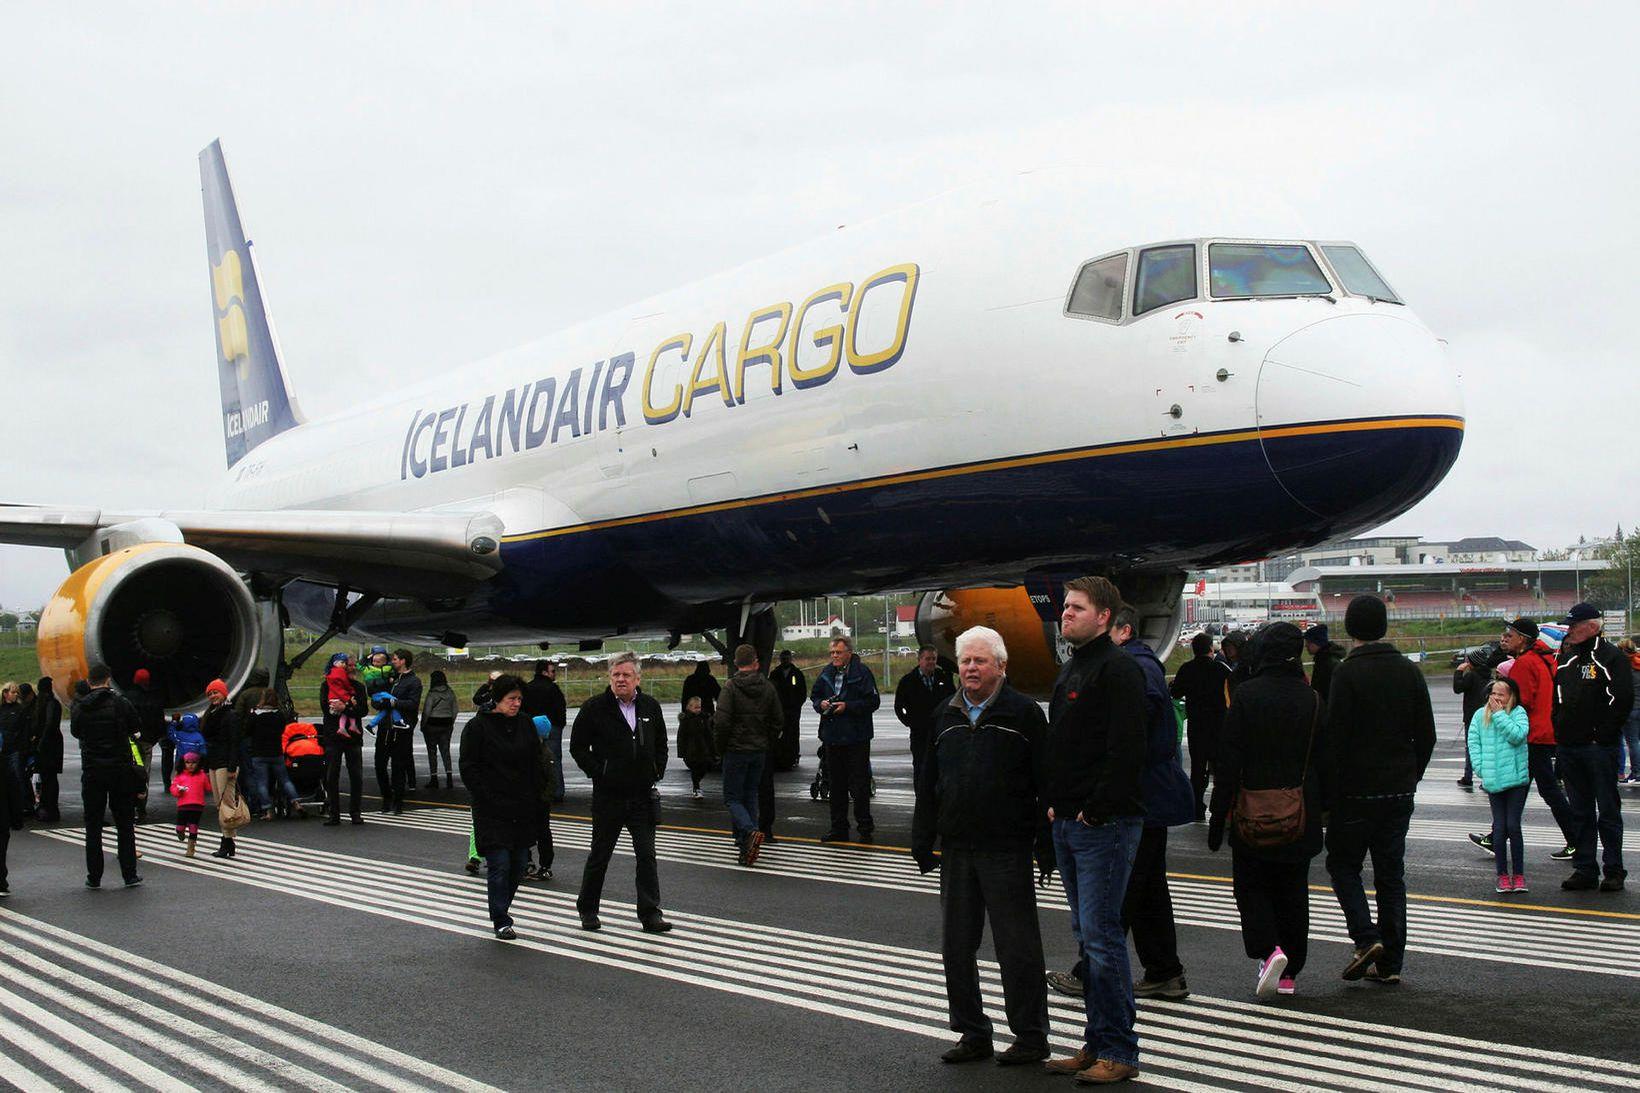 Starfsemi Icelandair Cargo er umfangsmikil, en félagið gerir útnokkrar þotur …